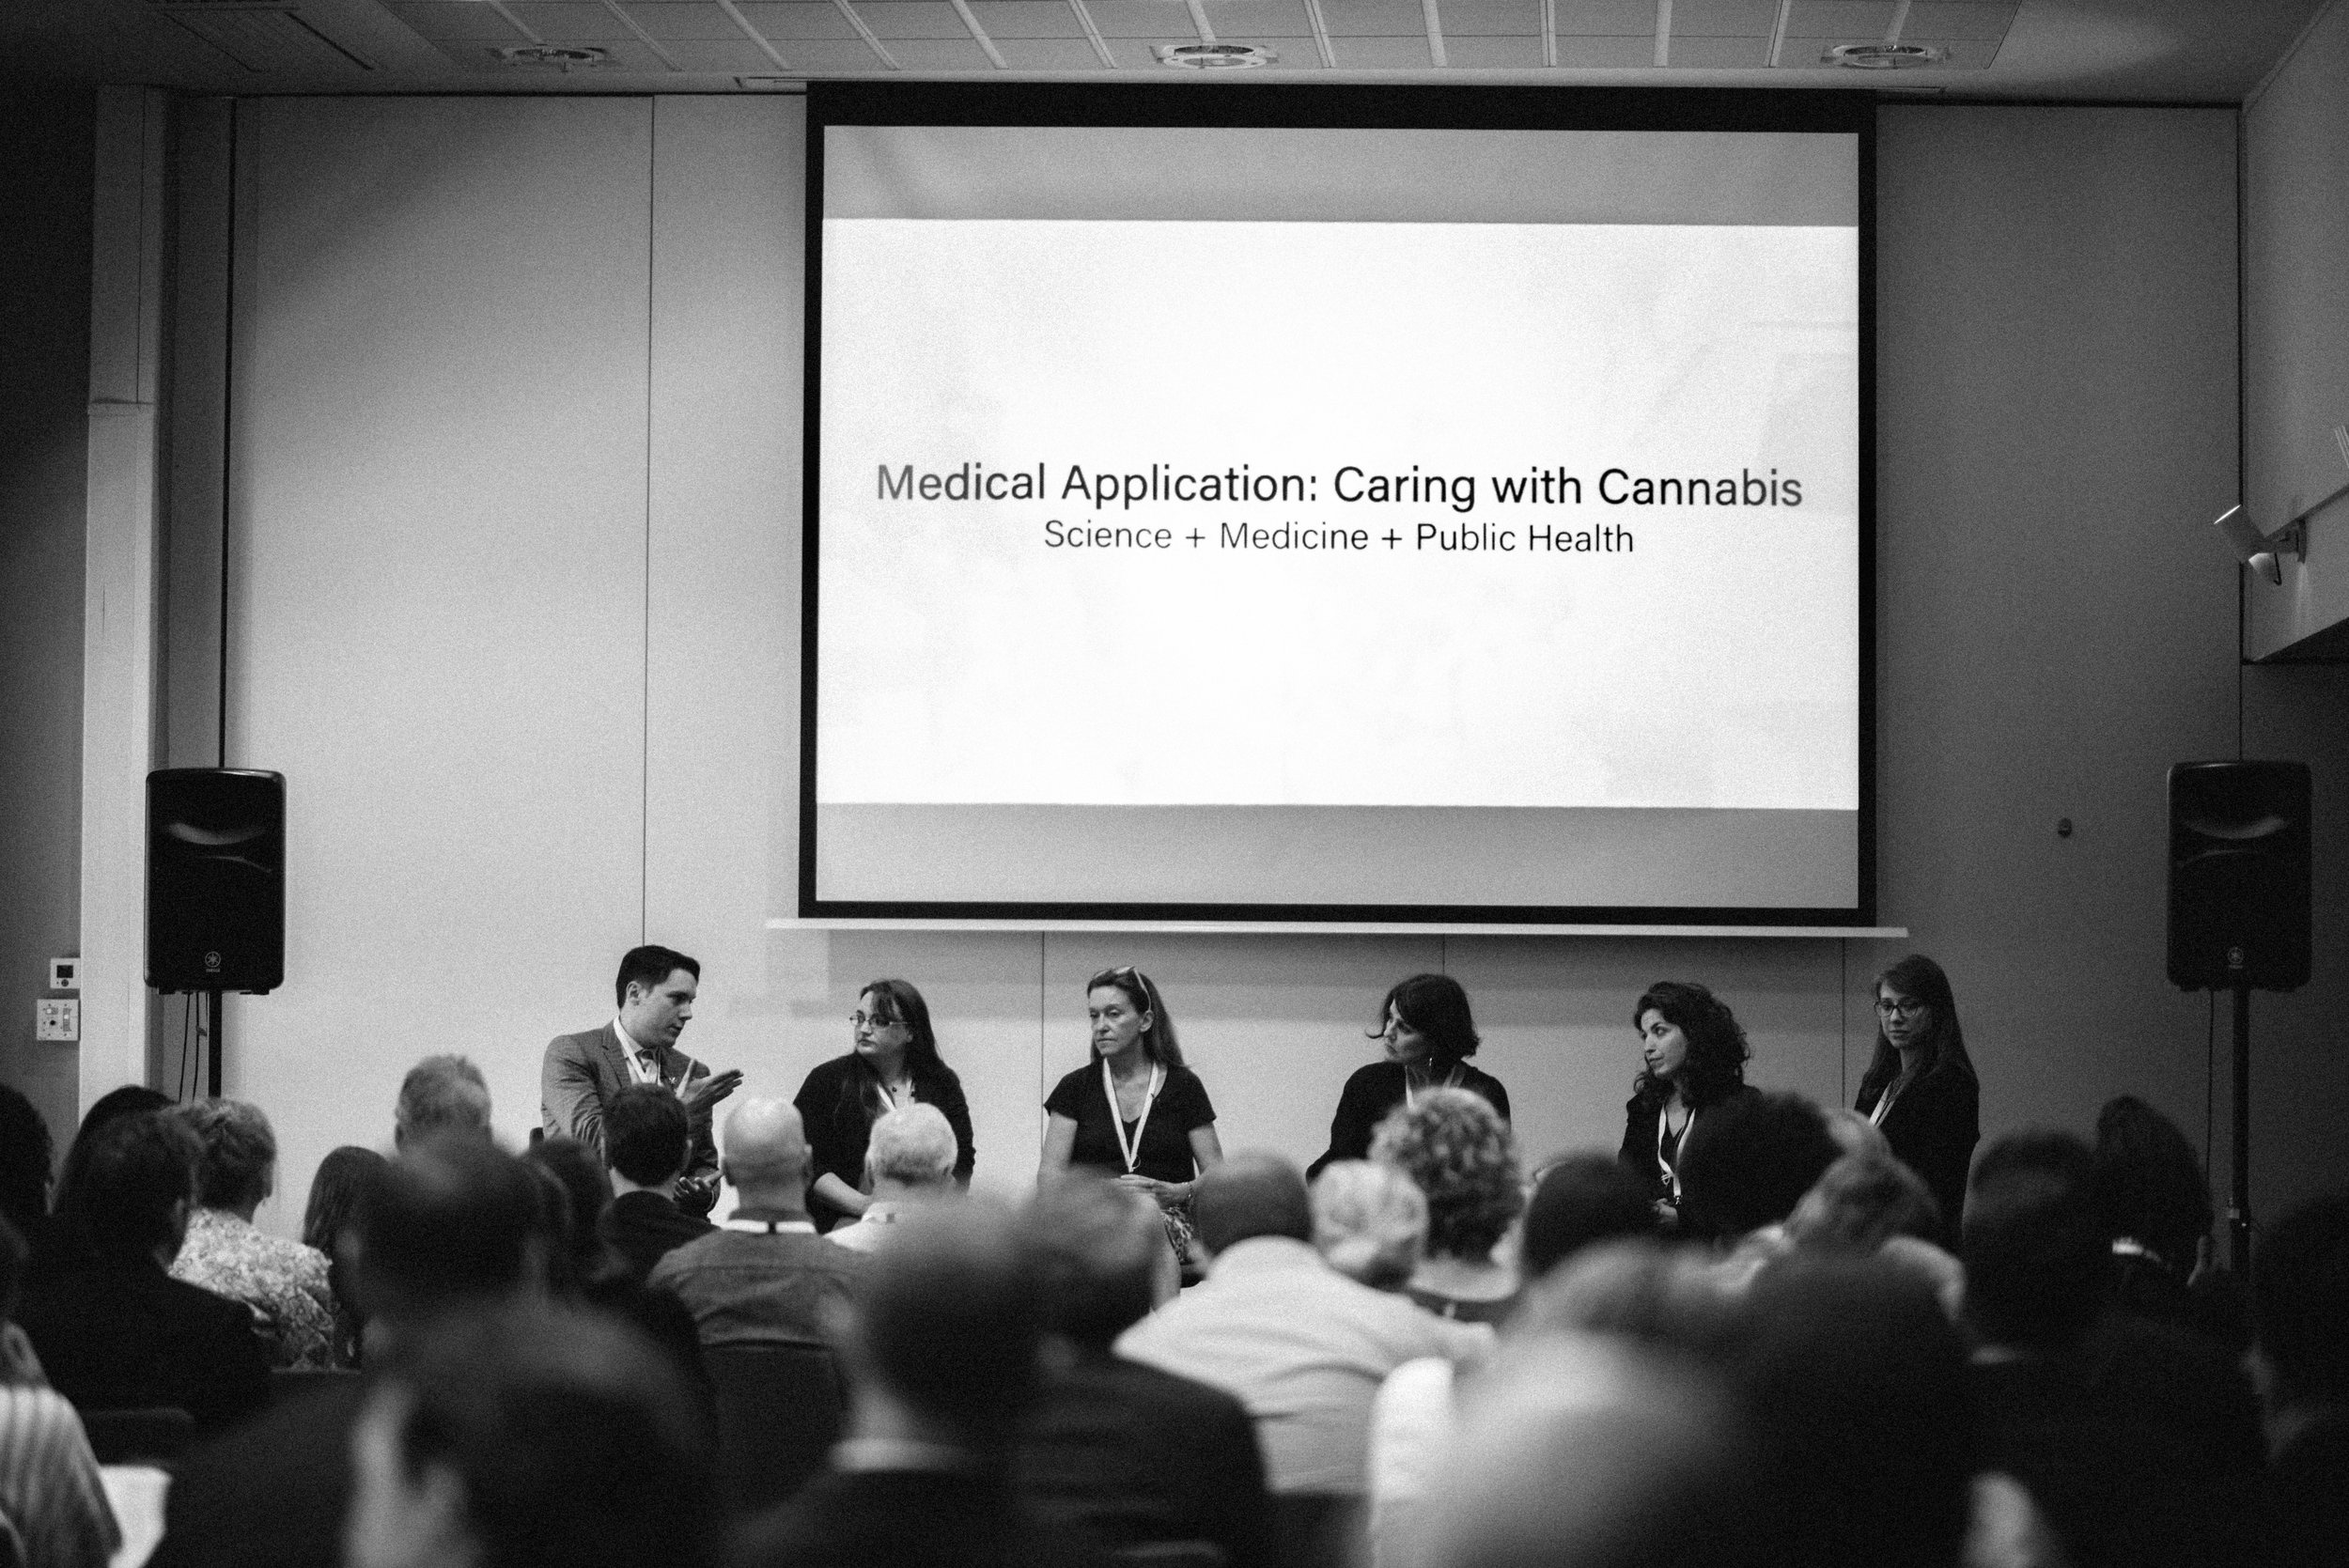 CannabisEuropaMedical.jpg